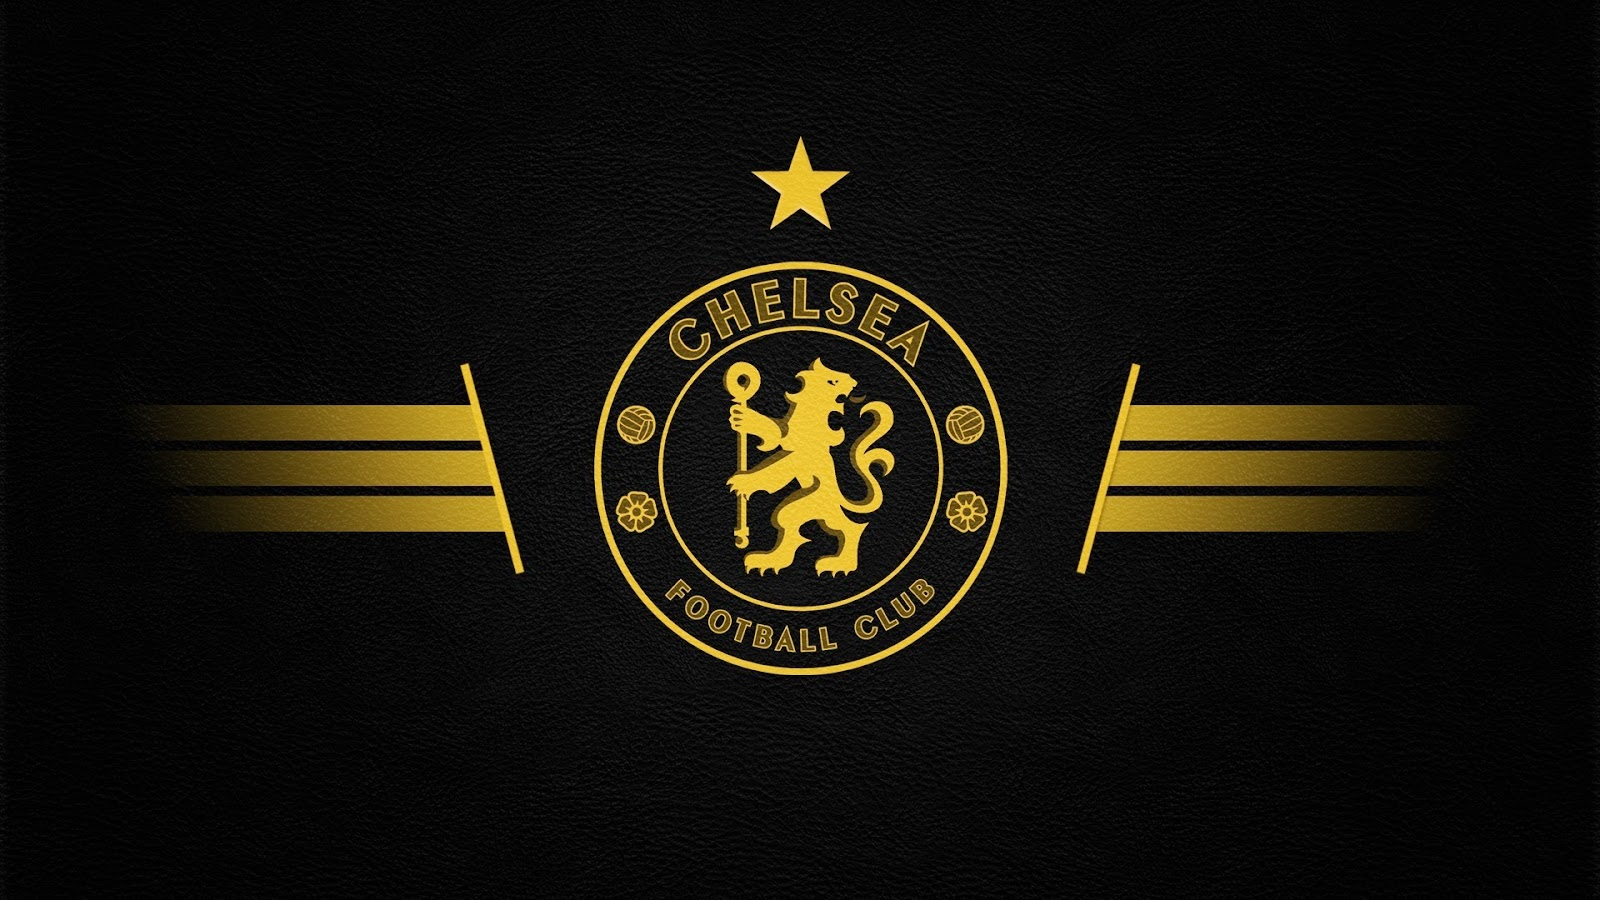 Football: Chelsea Football Club HD Wallpapers